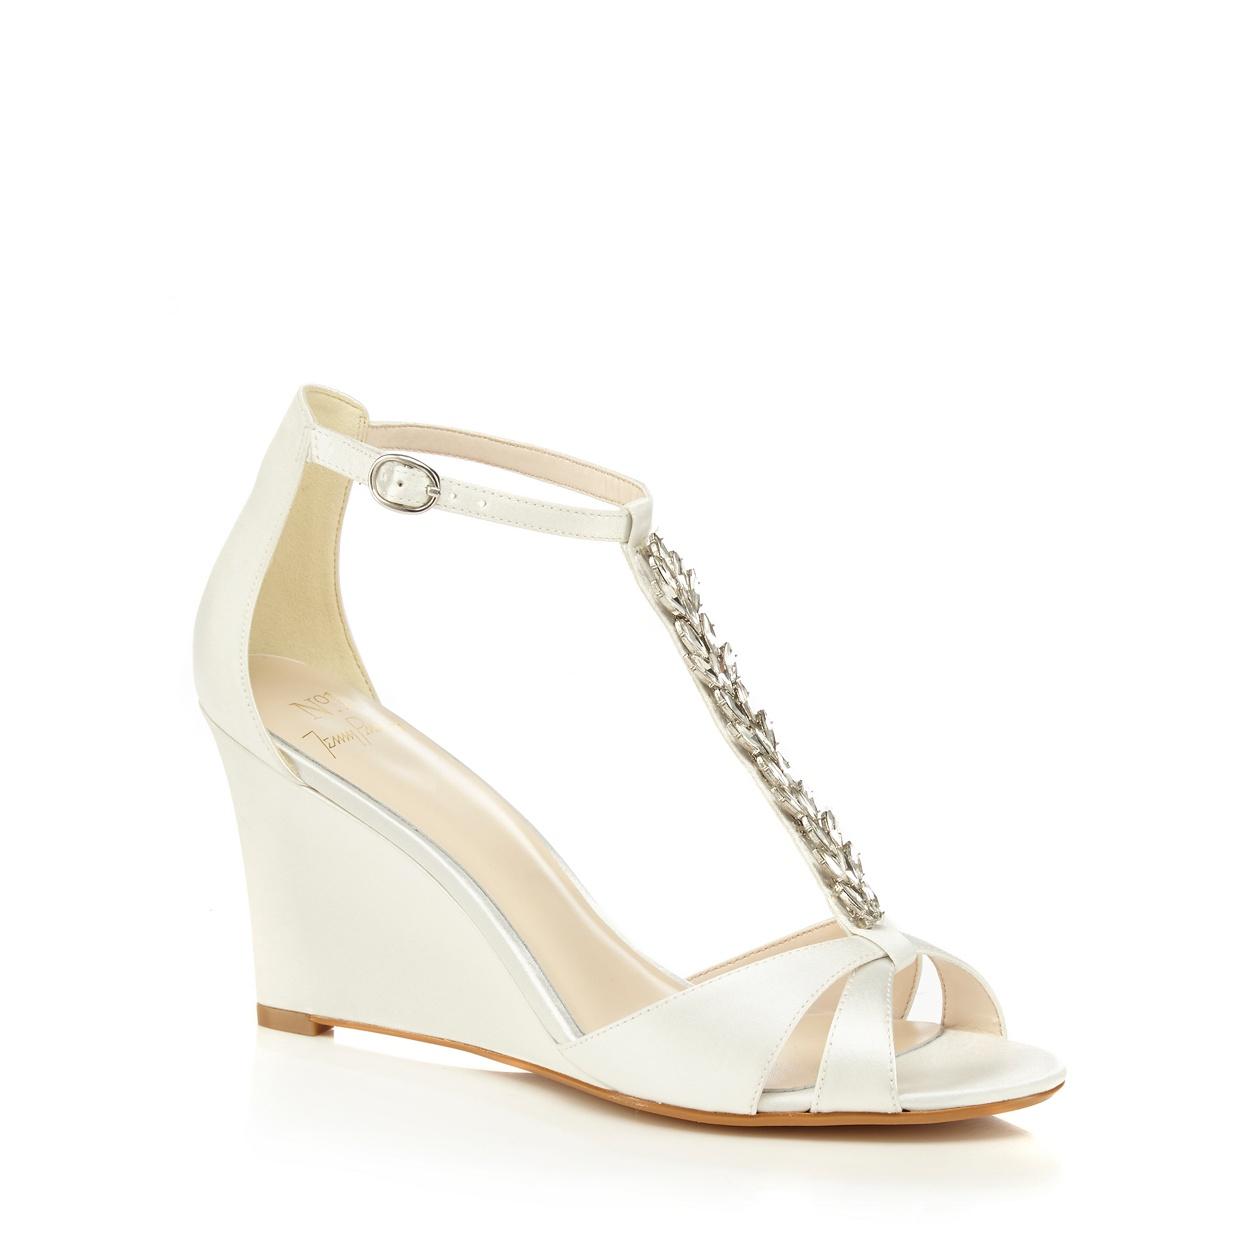 Women's sandals debenhams - No 1 Jenny Packham Ivory Satin Ping High Wedge Heel T